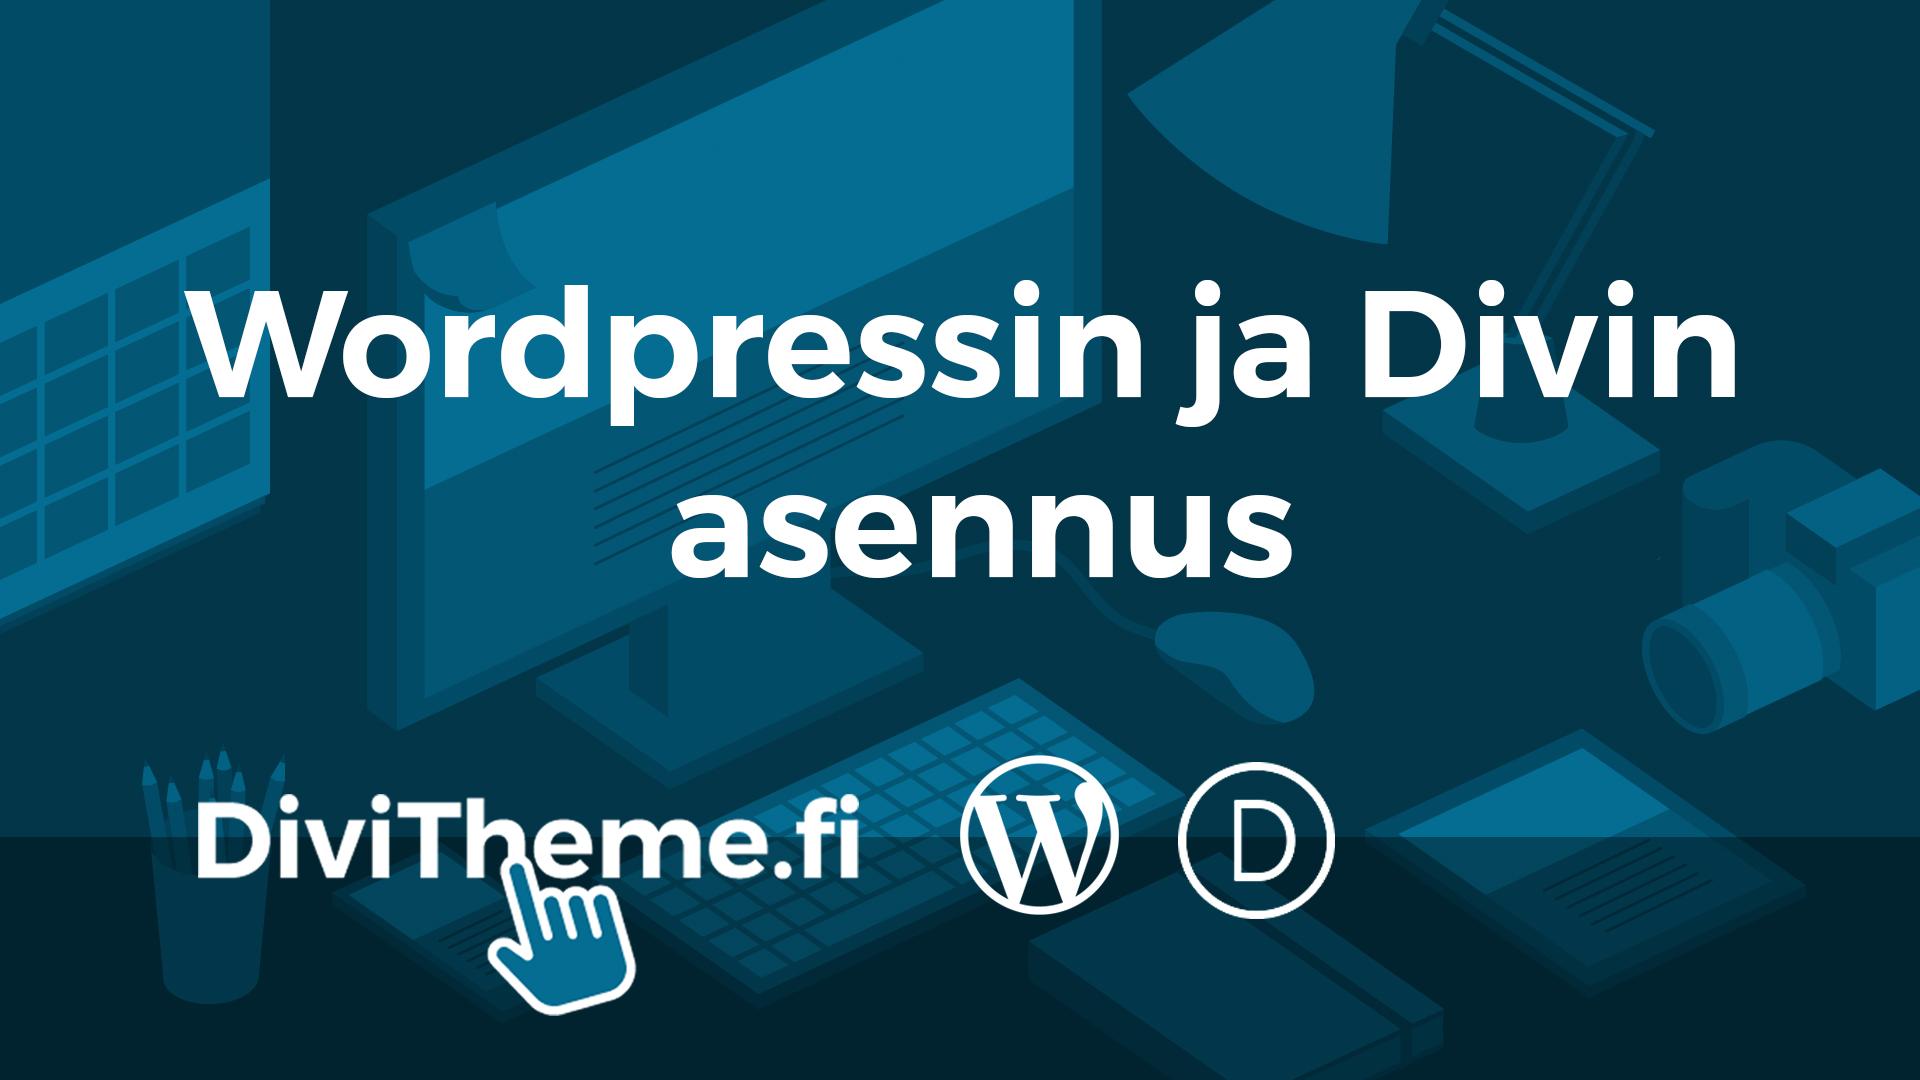 WordPressin ja Divin asennus